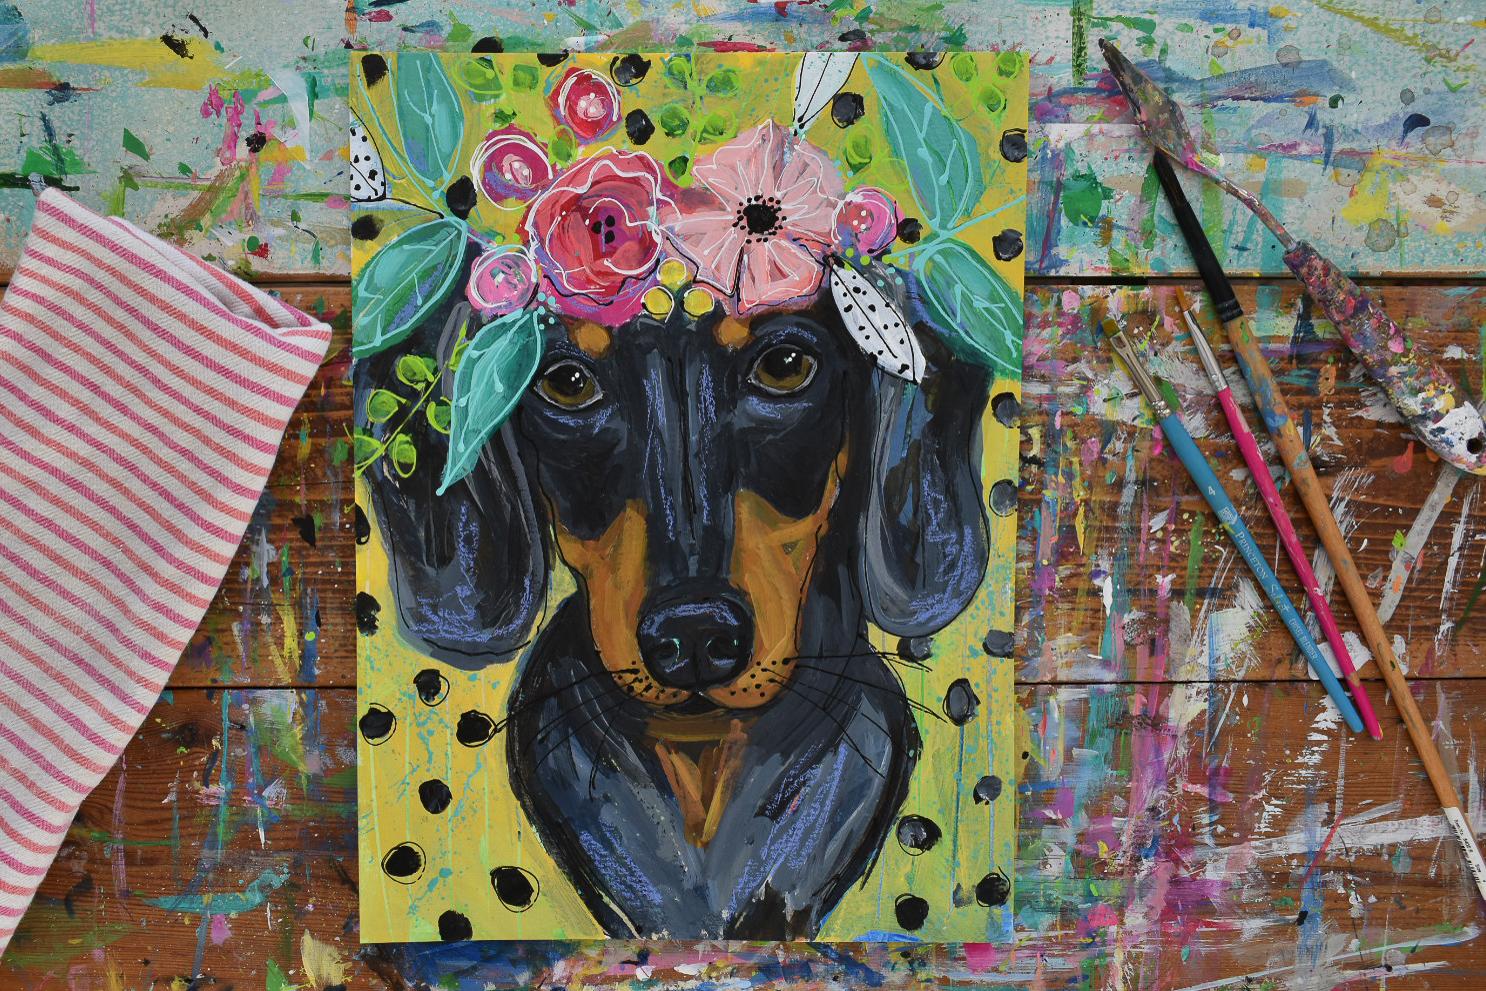 bohopainting_dachshund_petportrait_flowercrown_daisyfaithart4.jpg